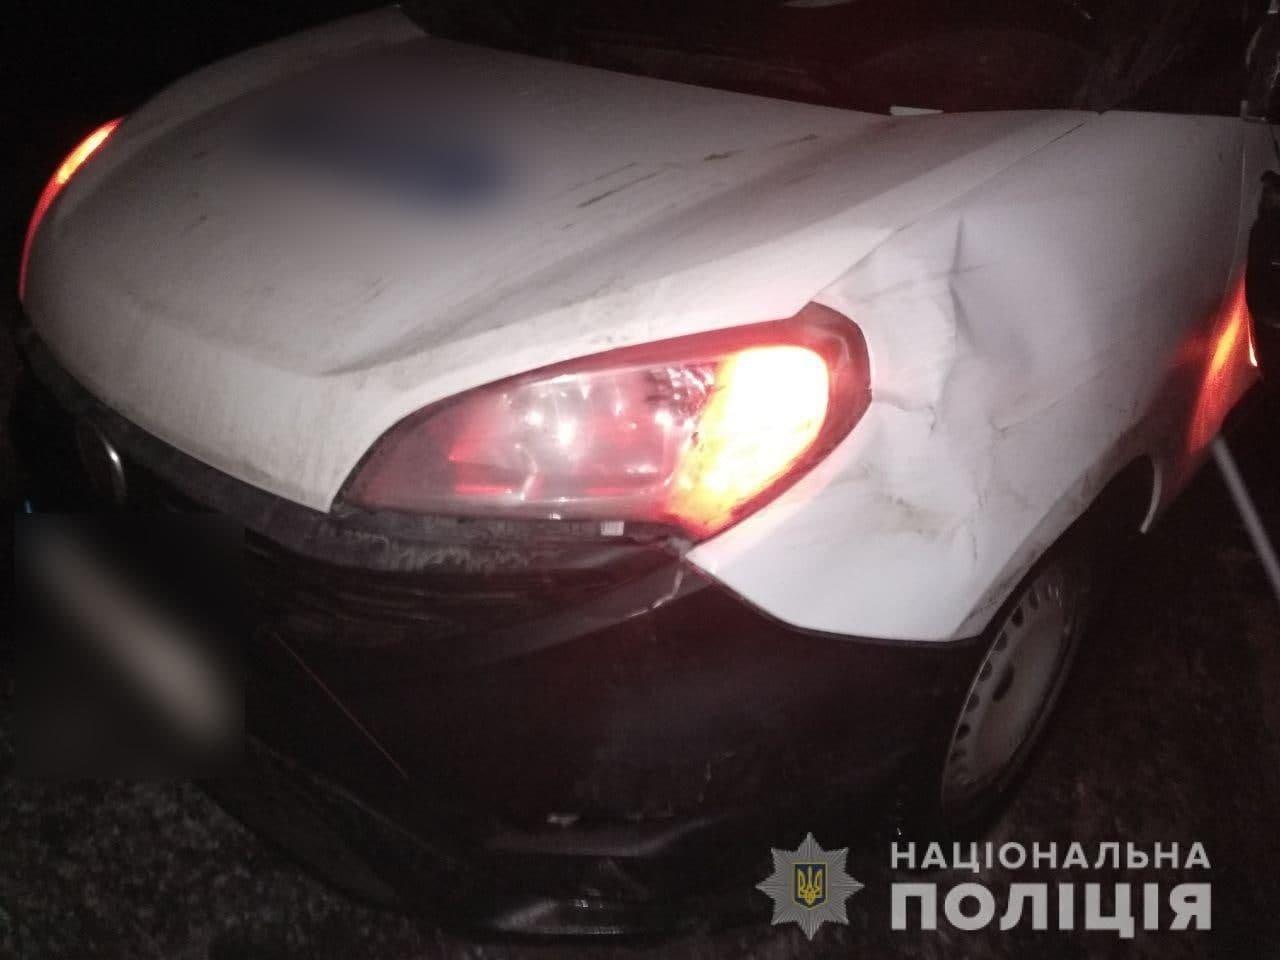 В Харькове на пешеходном переходе мужчина попал под колеса автомобиля, - ФОТО, фото-1